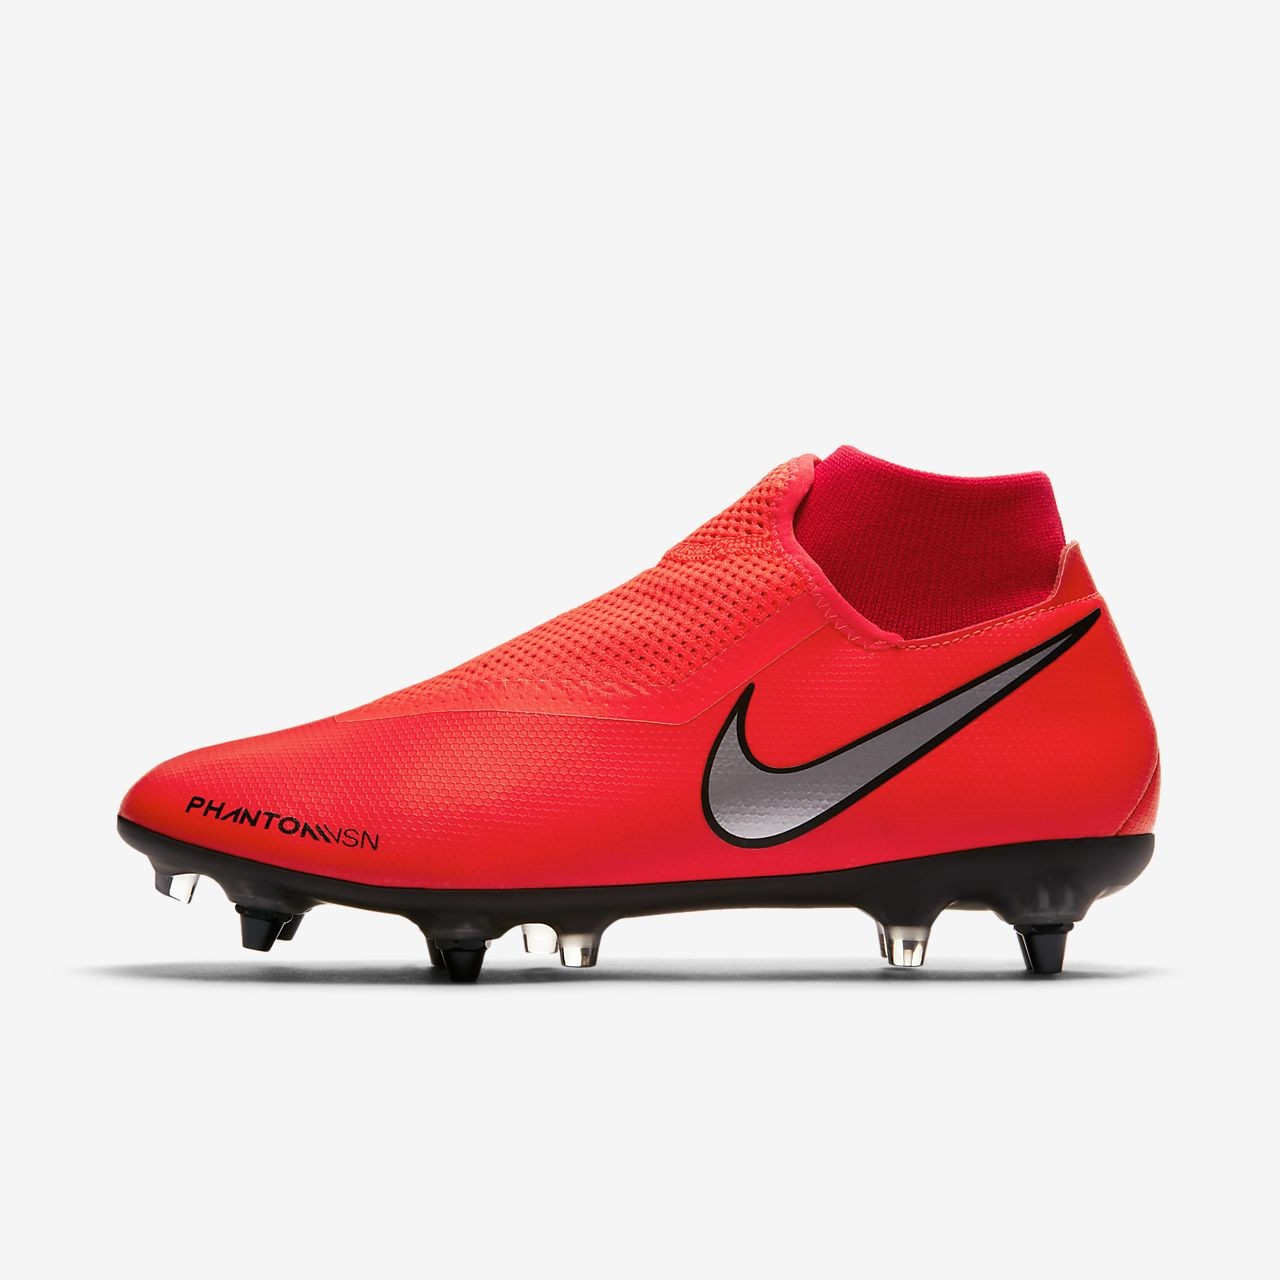 Nike PhantomVSN Academy Dynamic Fit SG-Pro Anti-Clog Traction Voetbalschoen (zachte ondergrond)